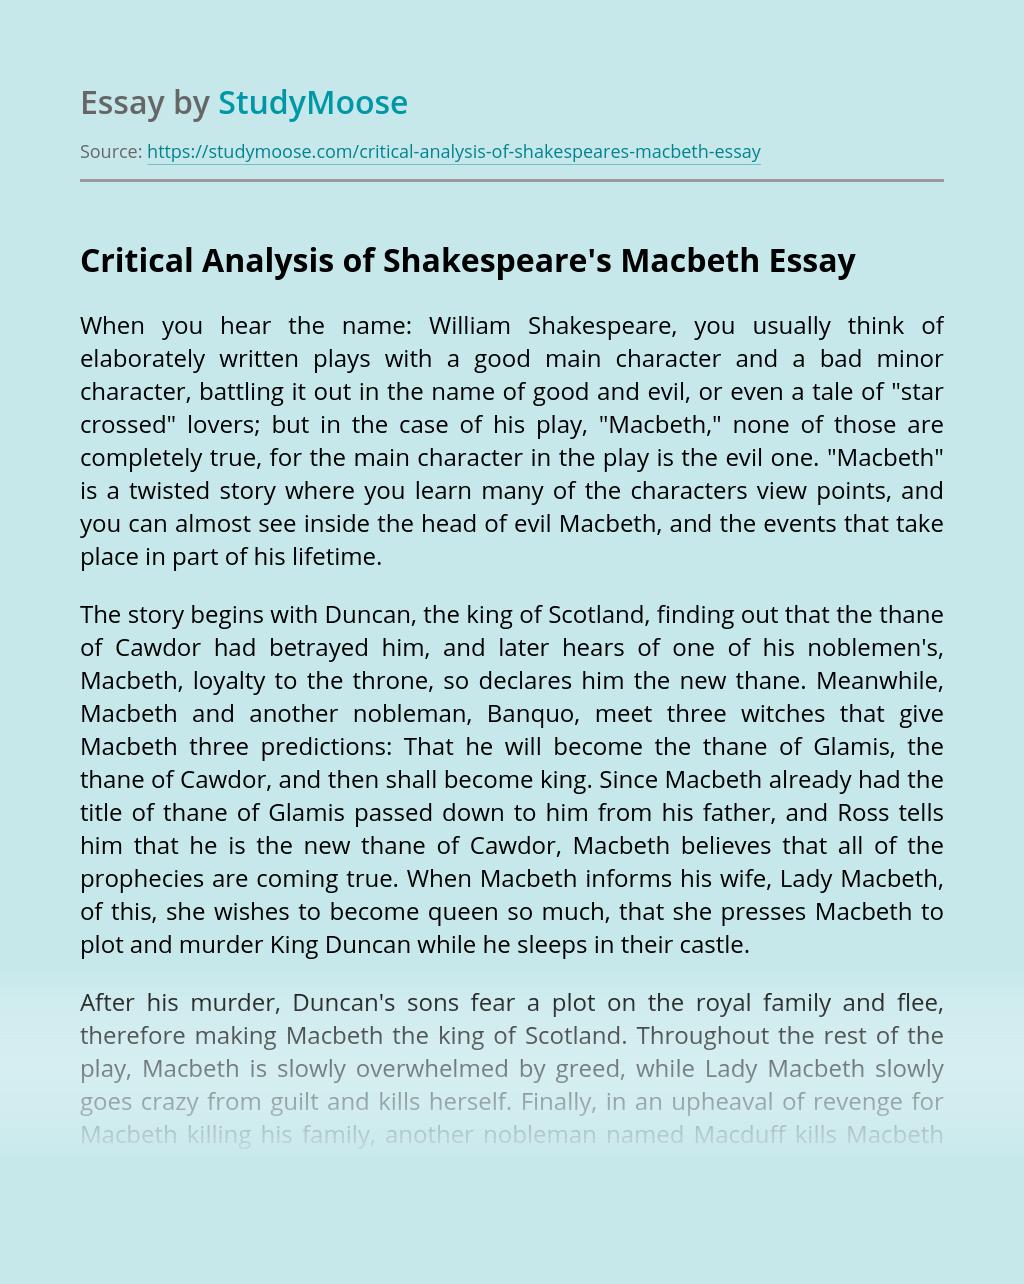 Critical Analysis of Shakespeare's Macbeth